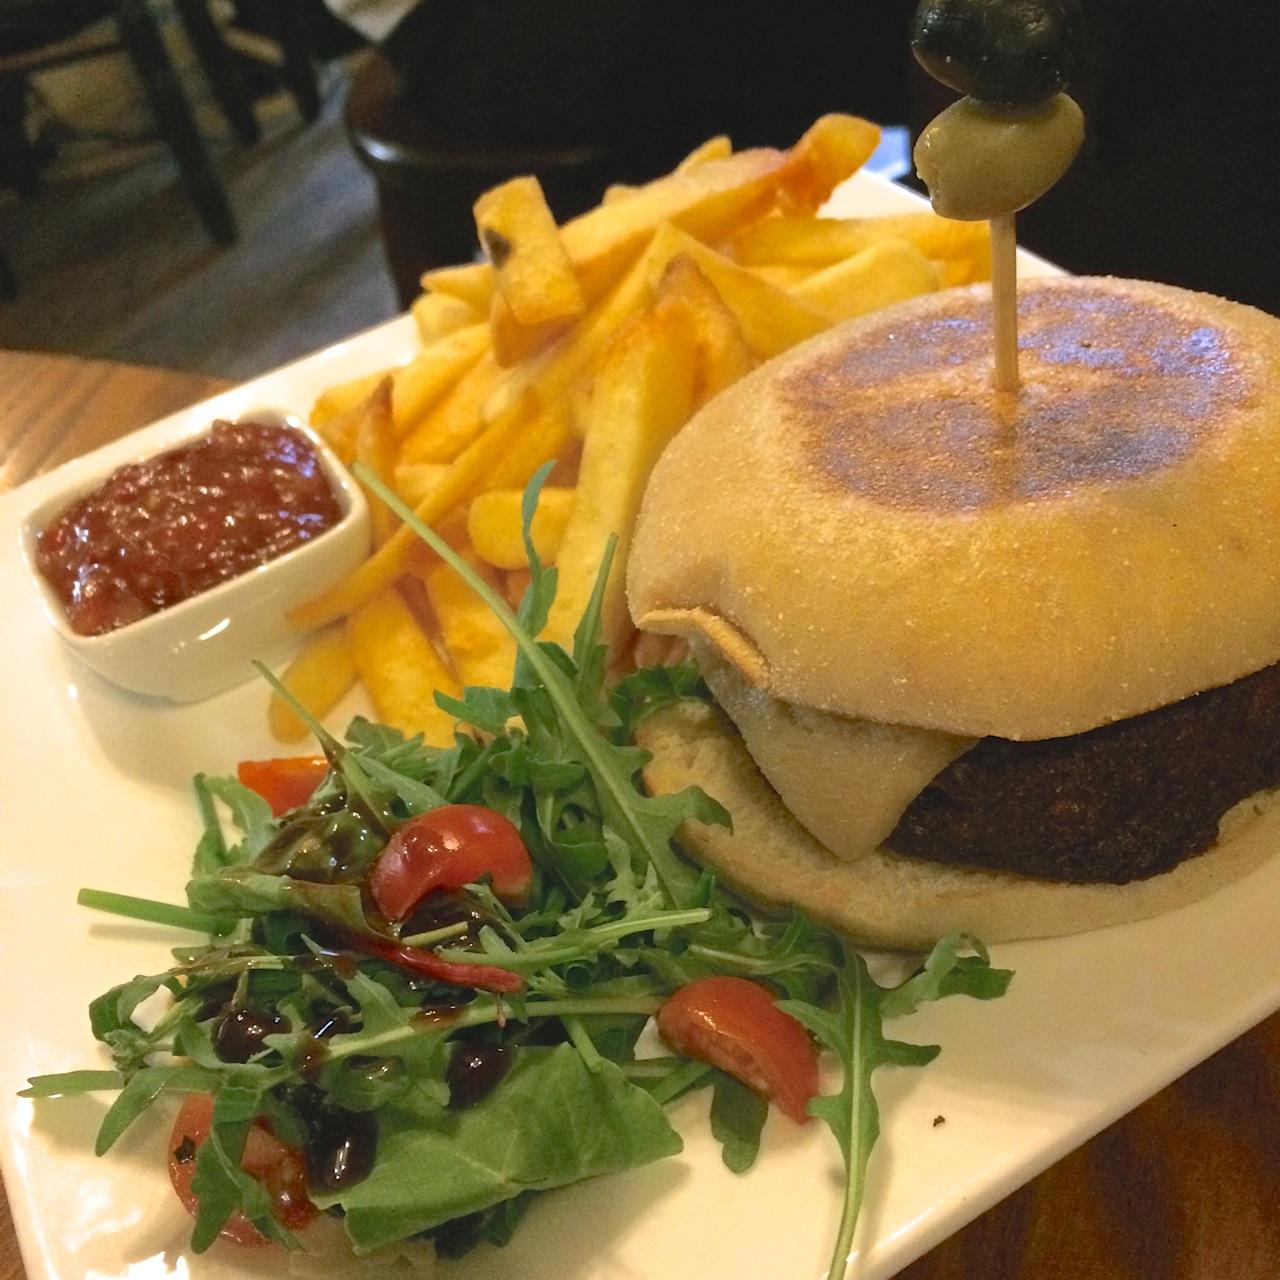 http://i2.wp.com/fatgayvegan.com/wp-content/uploads/2015/08/Burger-and-chips-vegan.jpg?fit=1280%2C1280